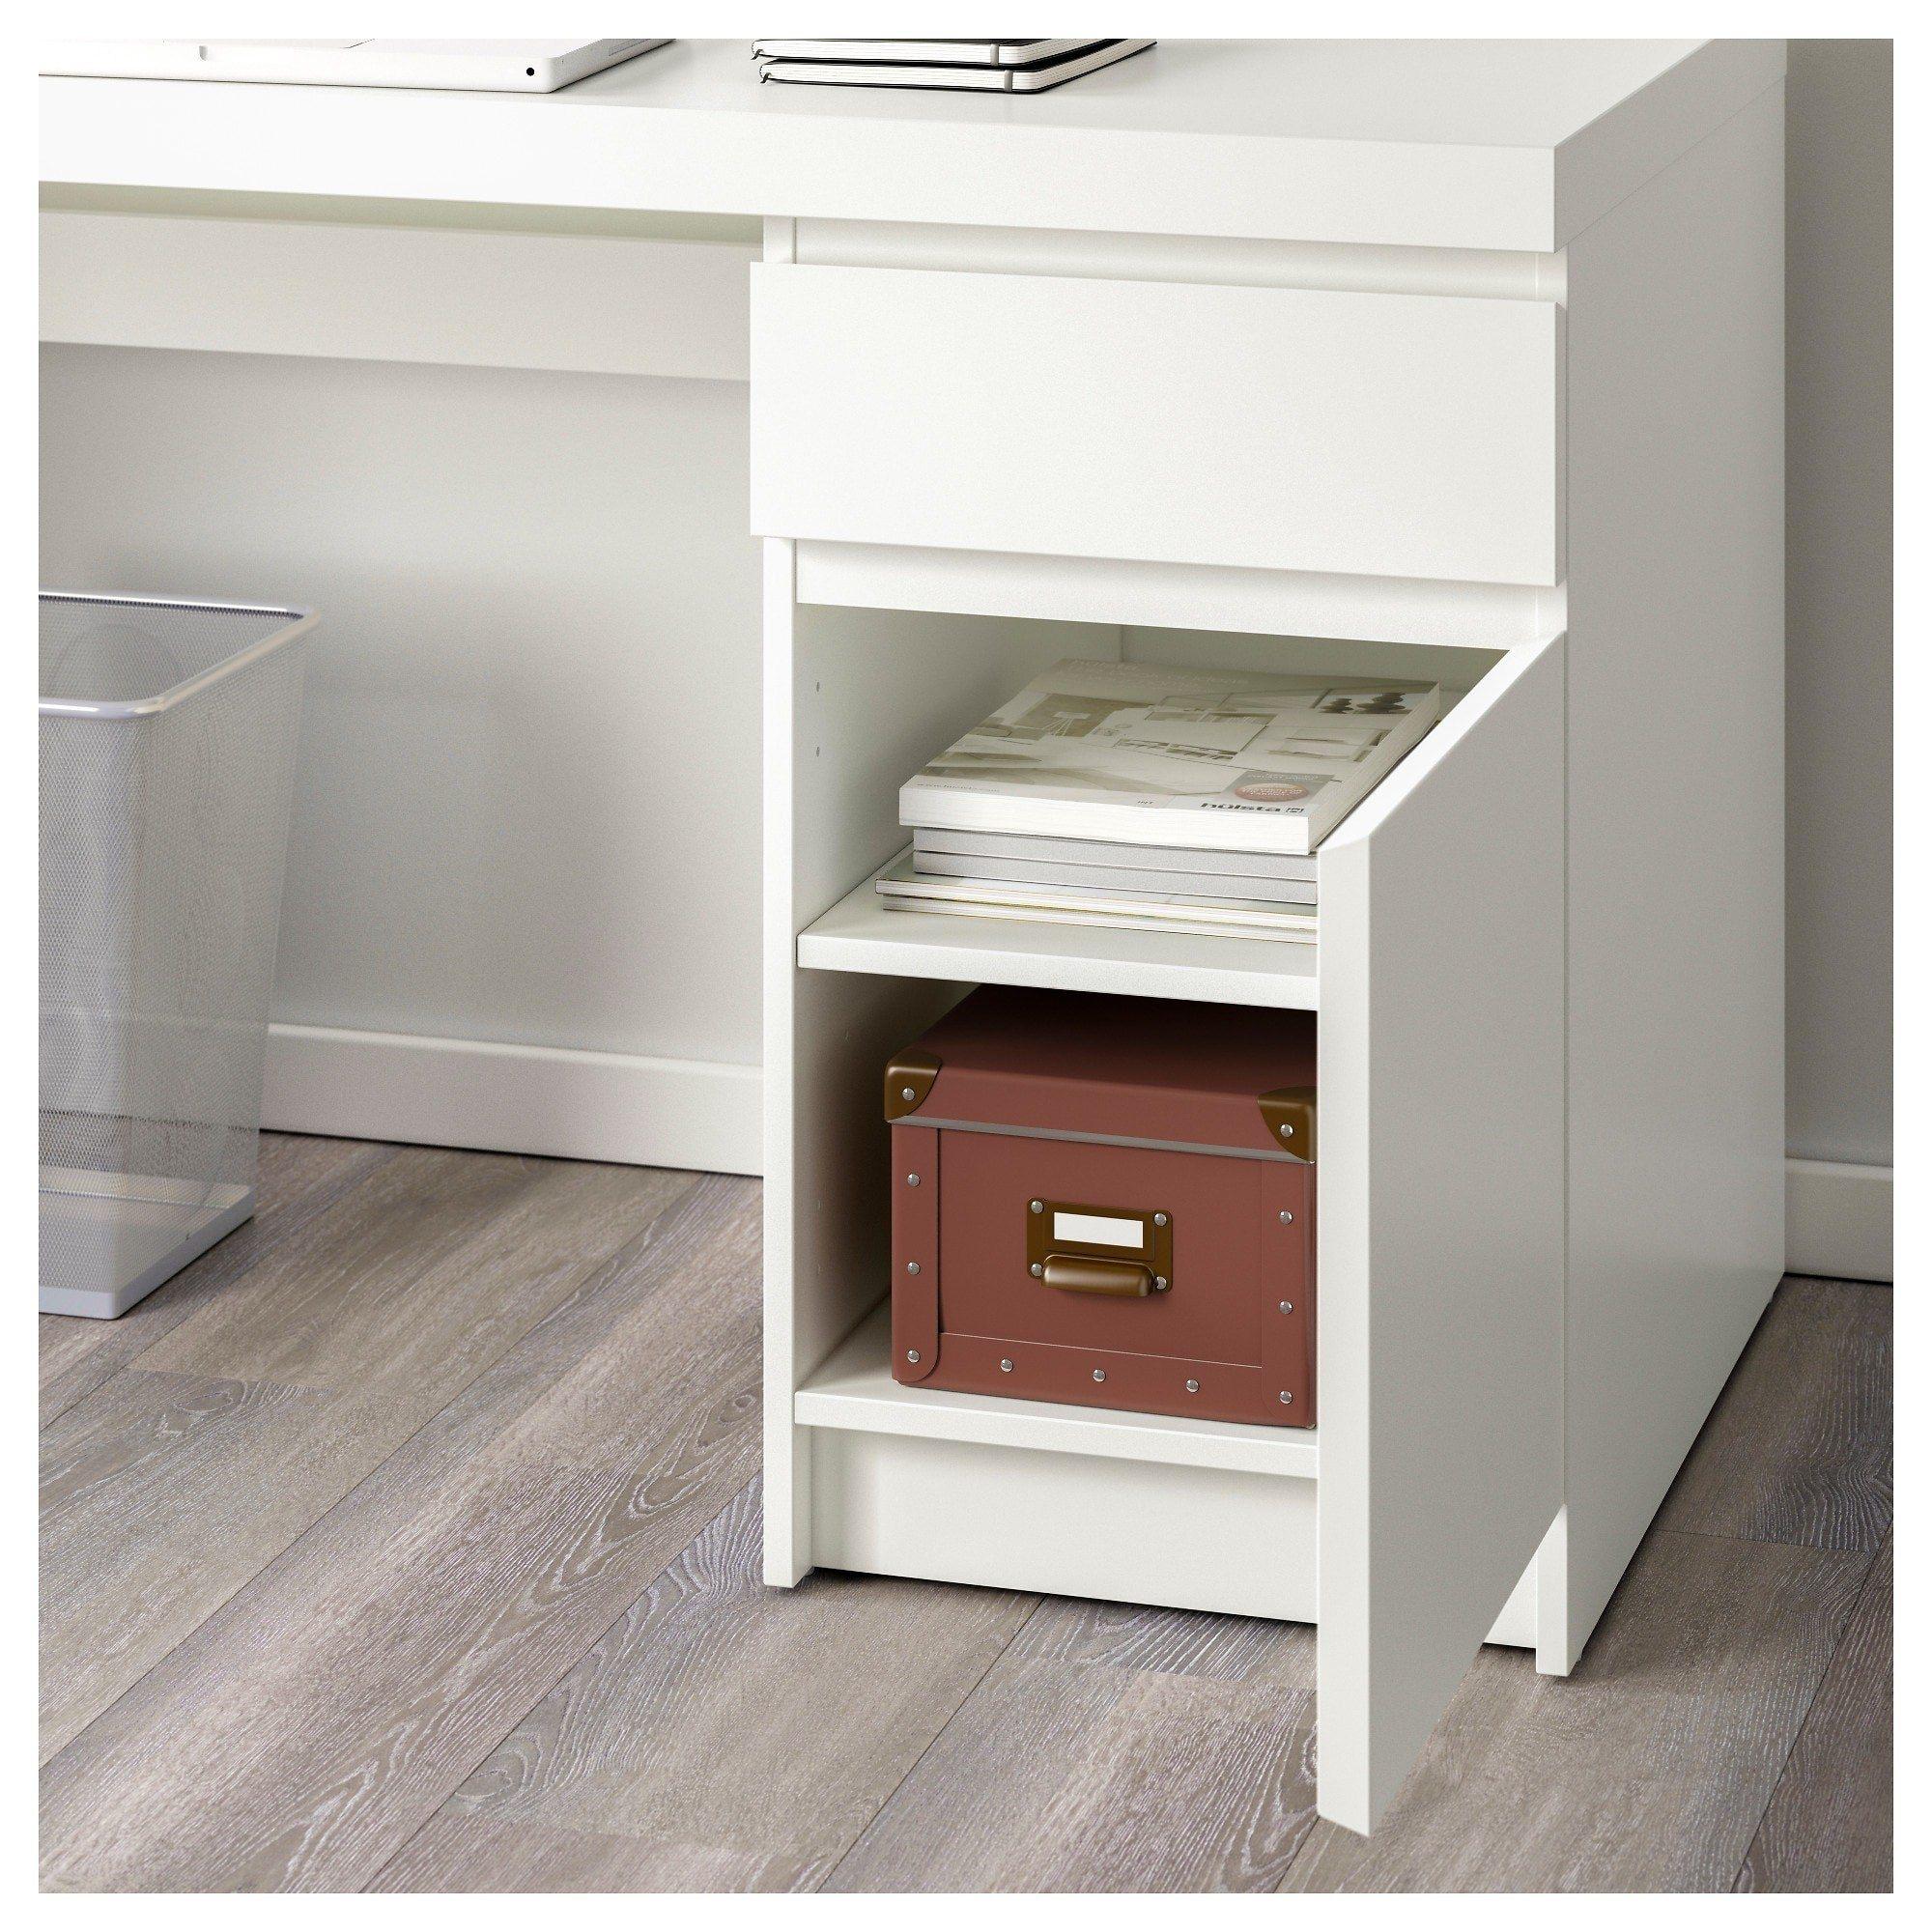 Ikea Malm Lit Coffre De Luxe Bureau Ikea Blanc